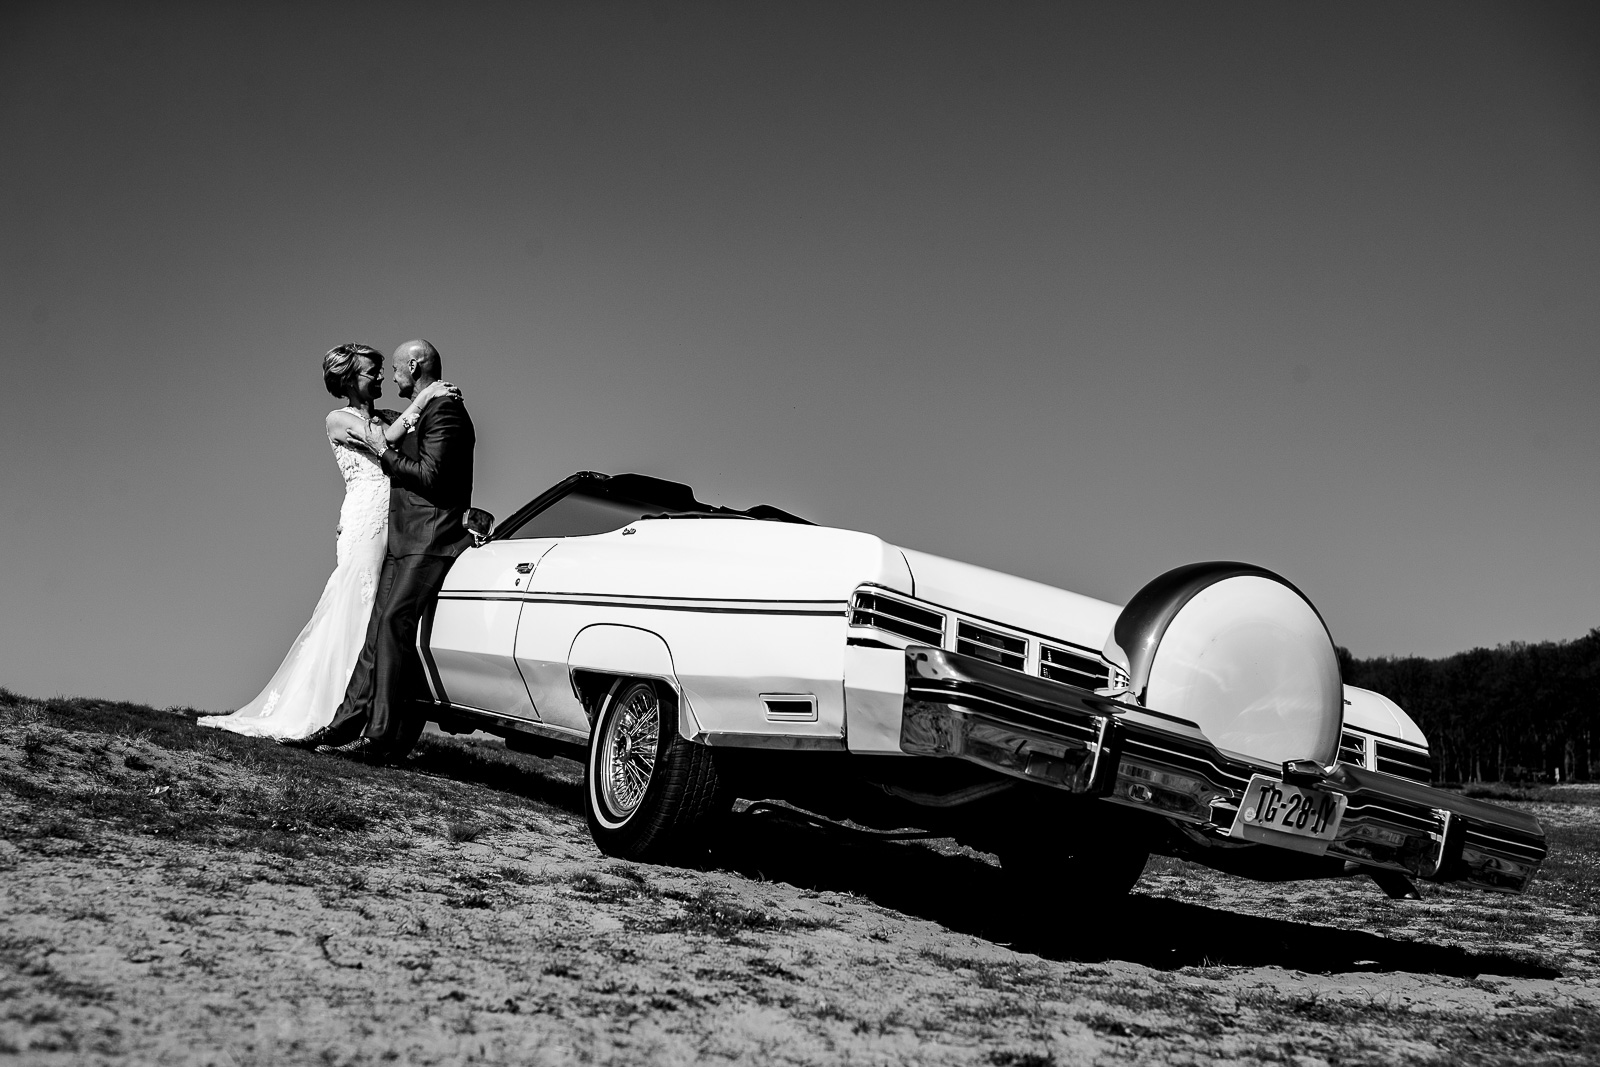 Bruidsfotograaf | Ede | John & Jacolien